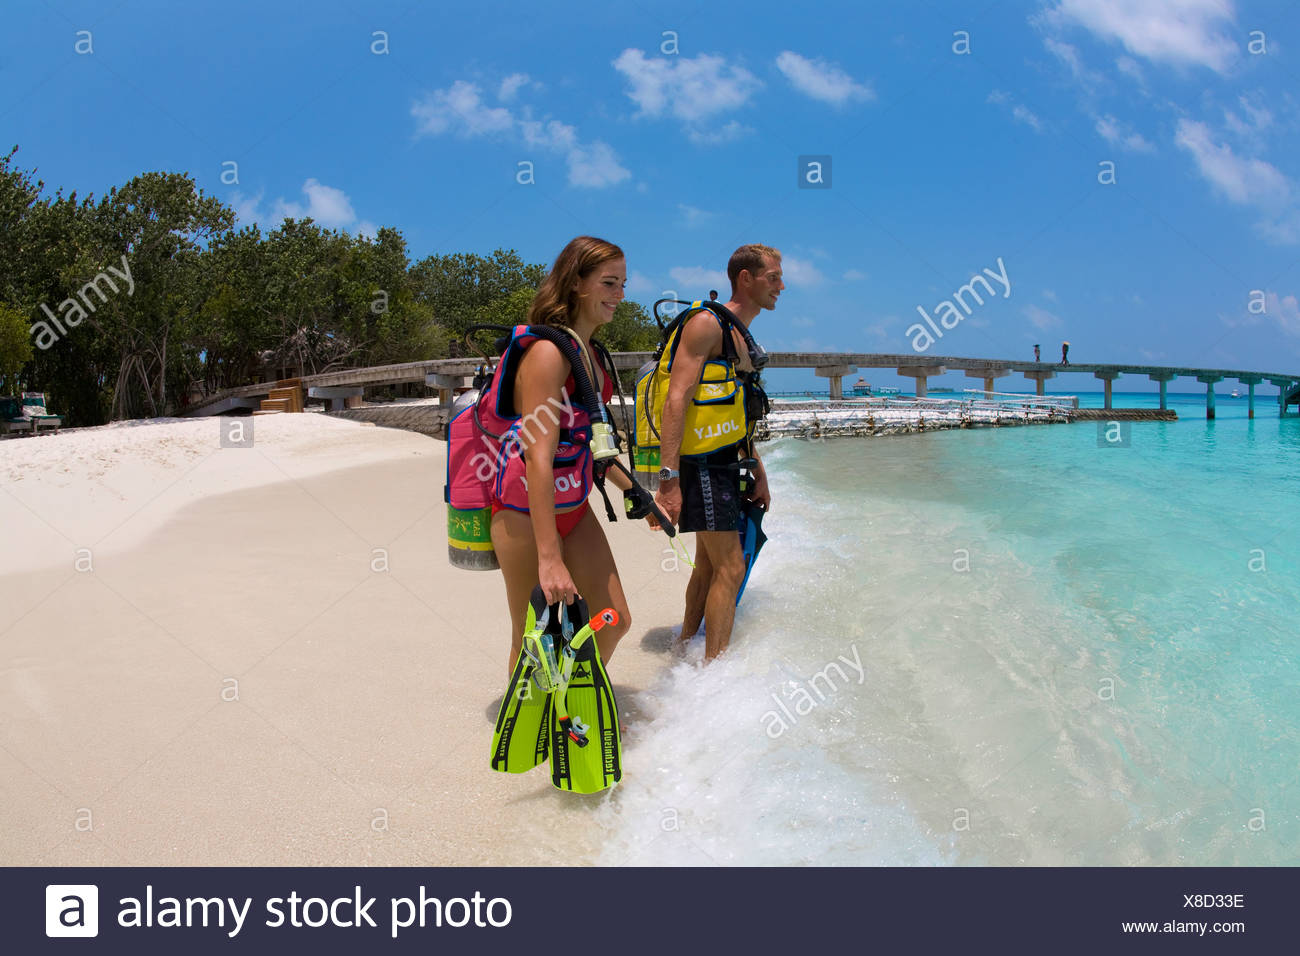 Couple, plongée sous-marine sur la plage de Reethi Beach Island, atoll de Baa, Maldives, océan Indien, Asie Photo Stock